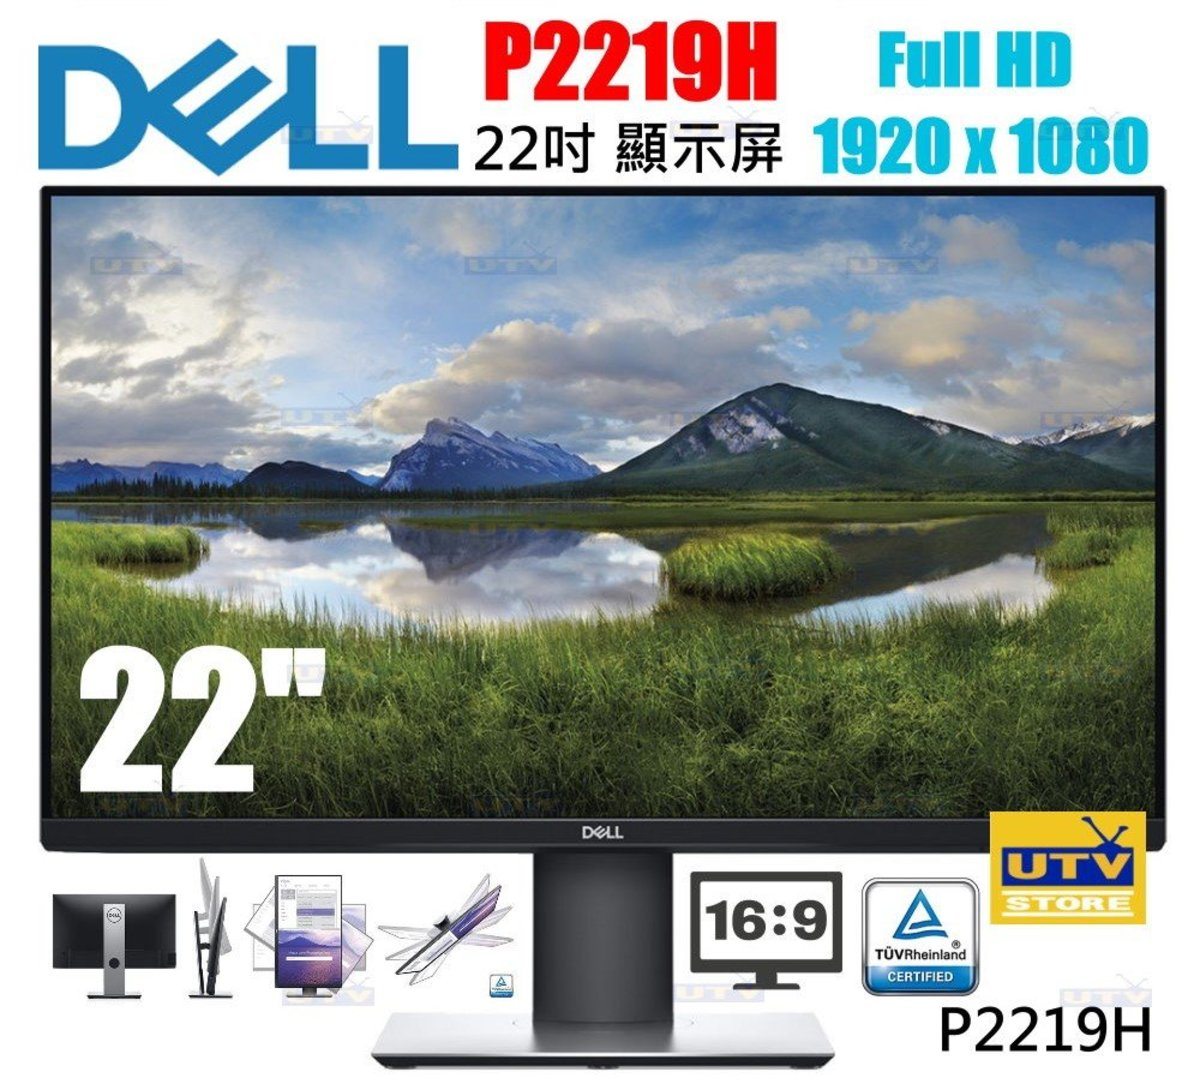 "P2219H 22"" Monitor"